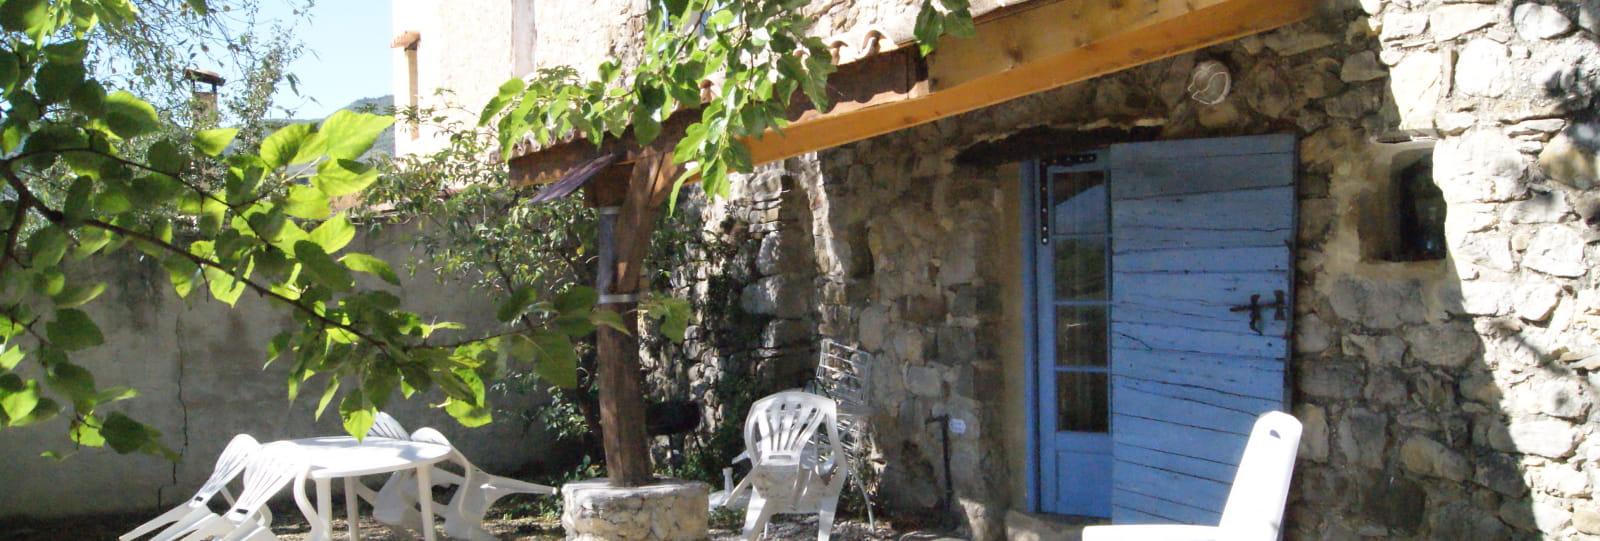 Domaine La Vanige - Gite Barjavel